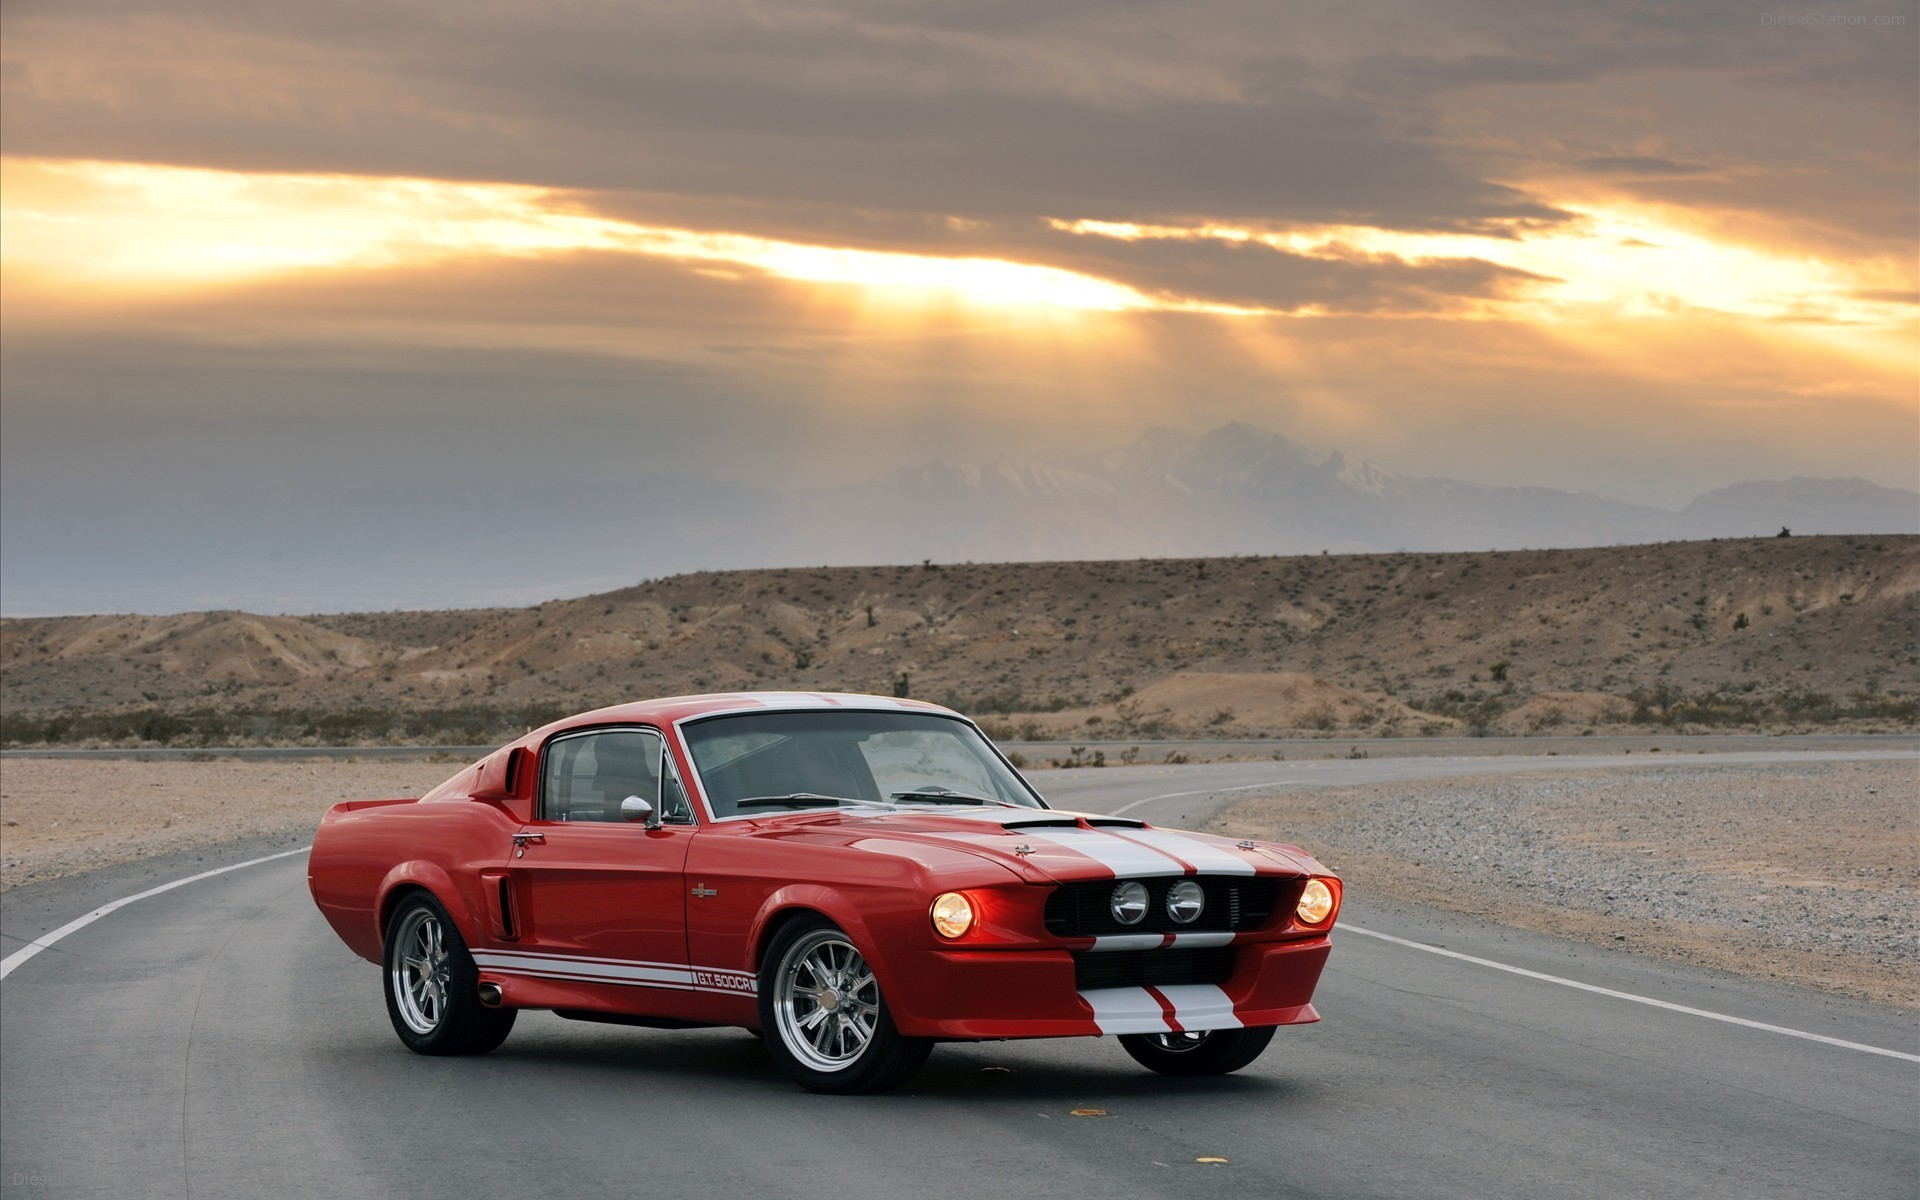 1967 Mustang Wallpaper 54 Pictures